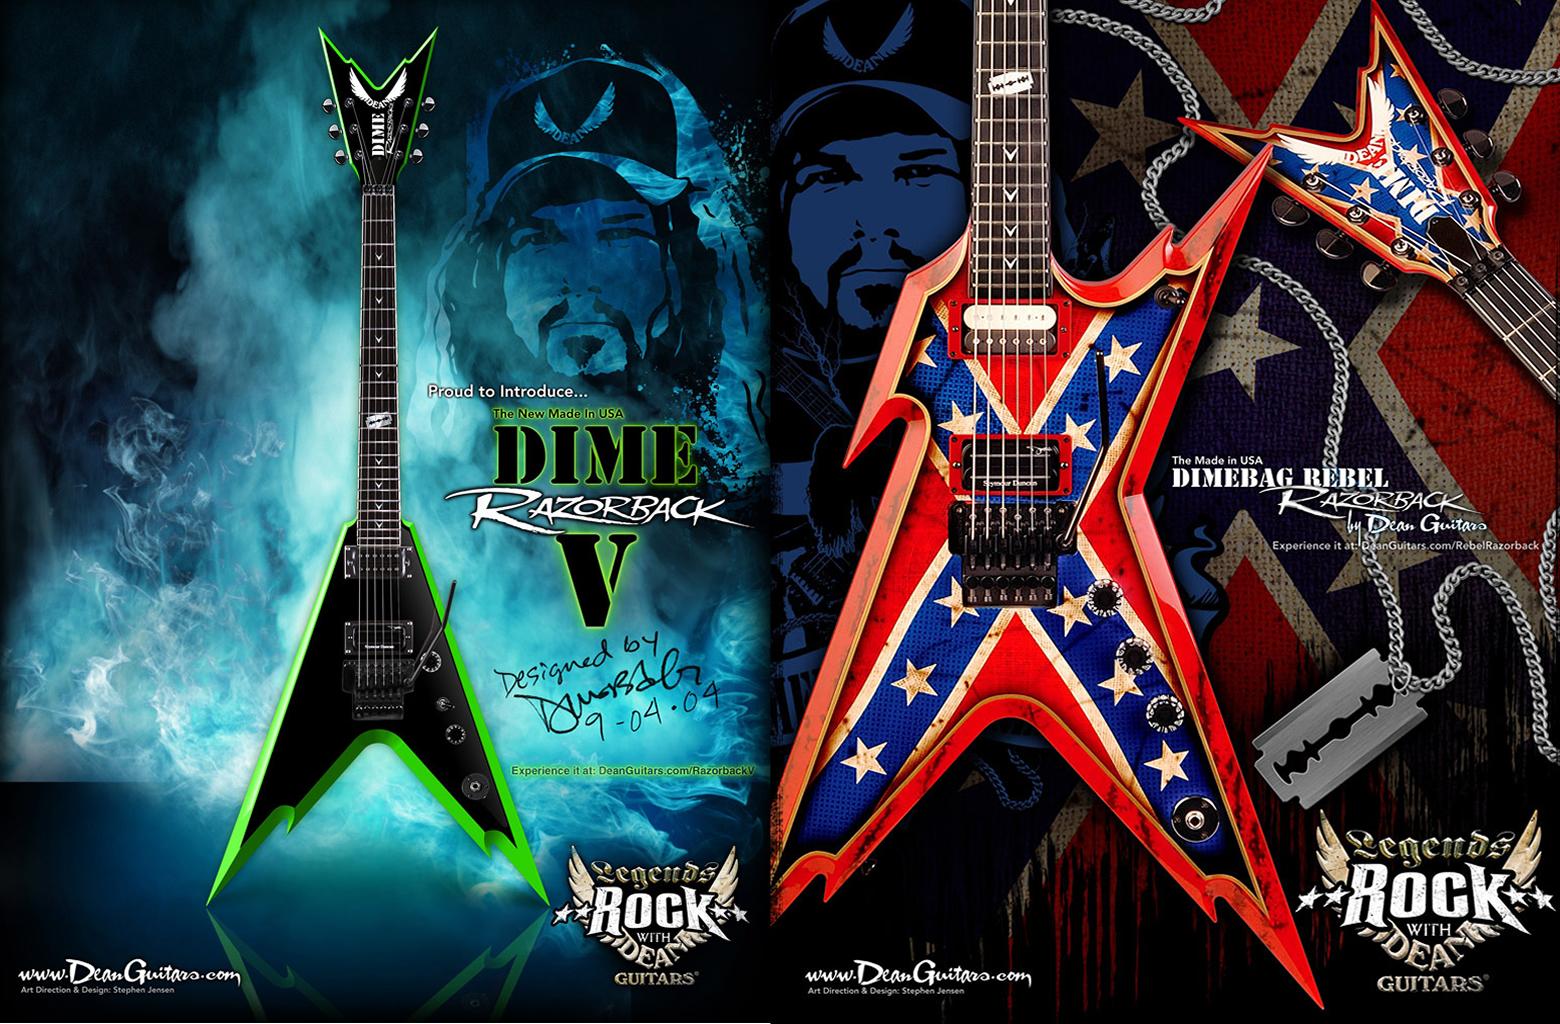 pantera groups bands thrash heavy metal hard rock album covers dimebag 1560x1024